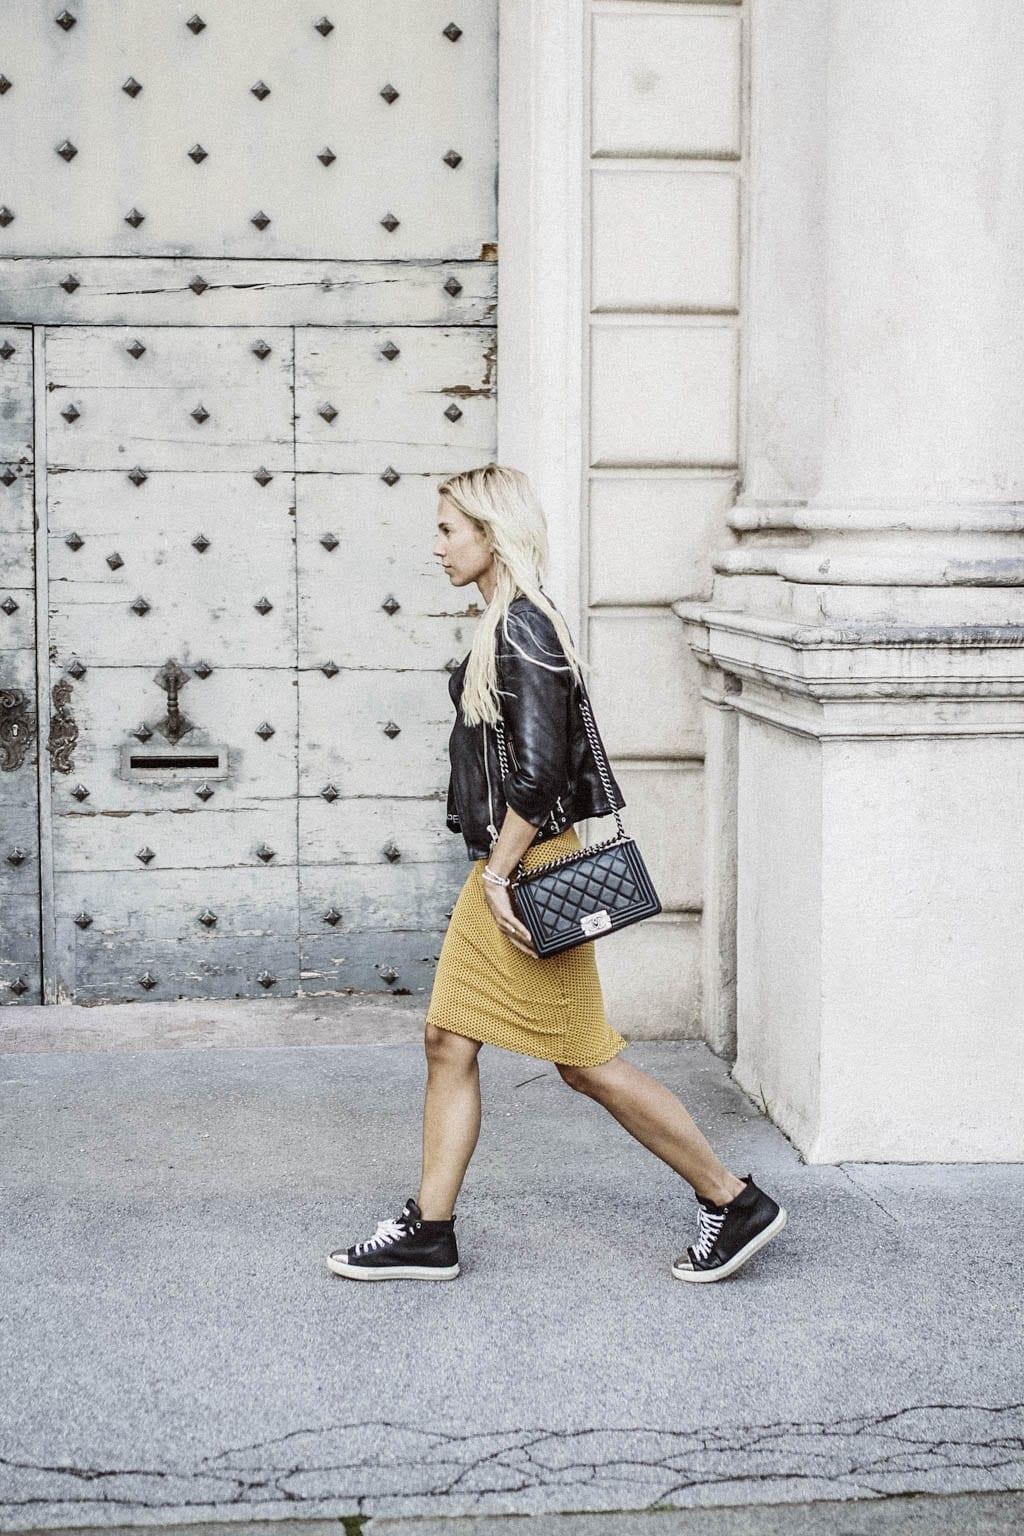 CK-Constantlly-K-Fashion-Street-Style-Blog-Rieger-Fashion-Salzburg-constantlyk.com-1827